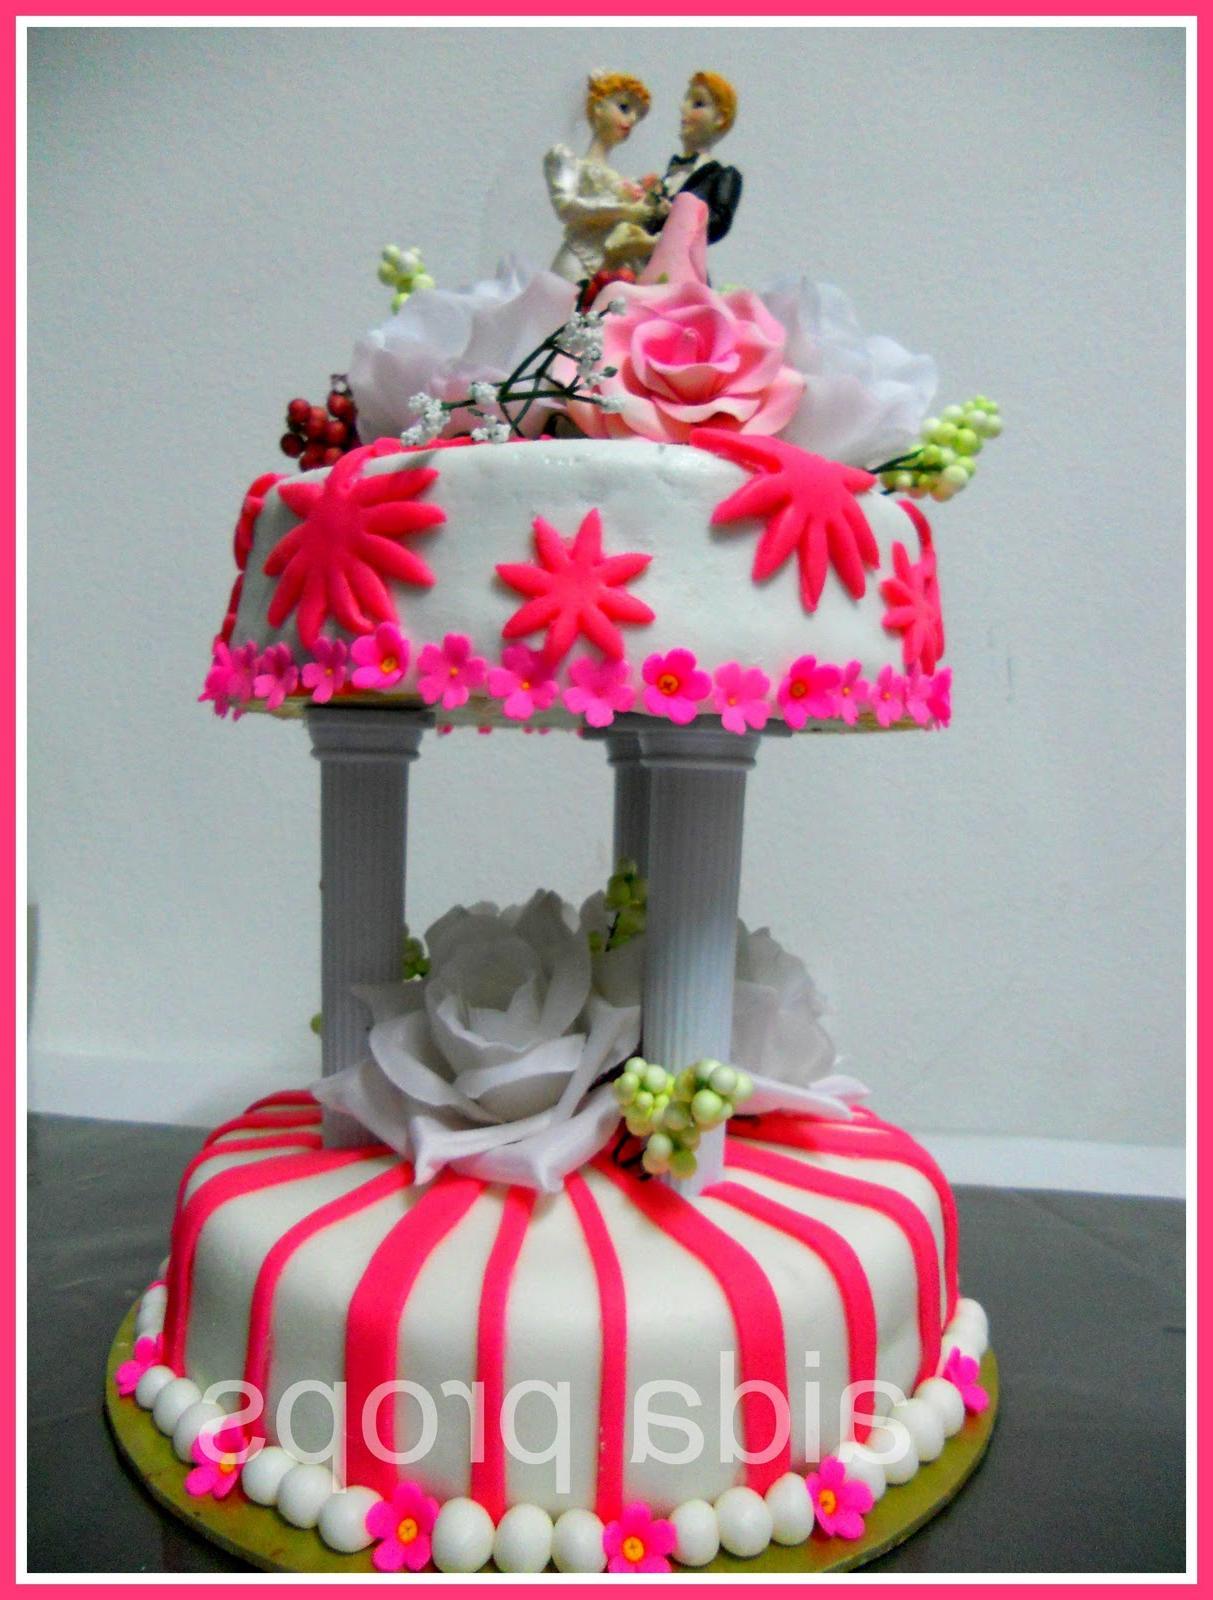 2 Responses to  fondant cake